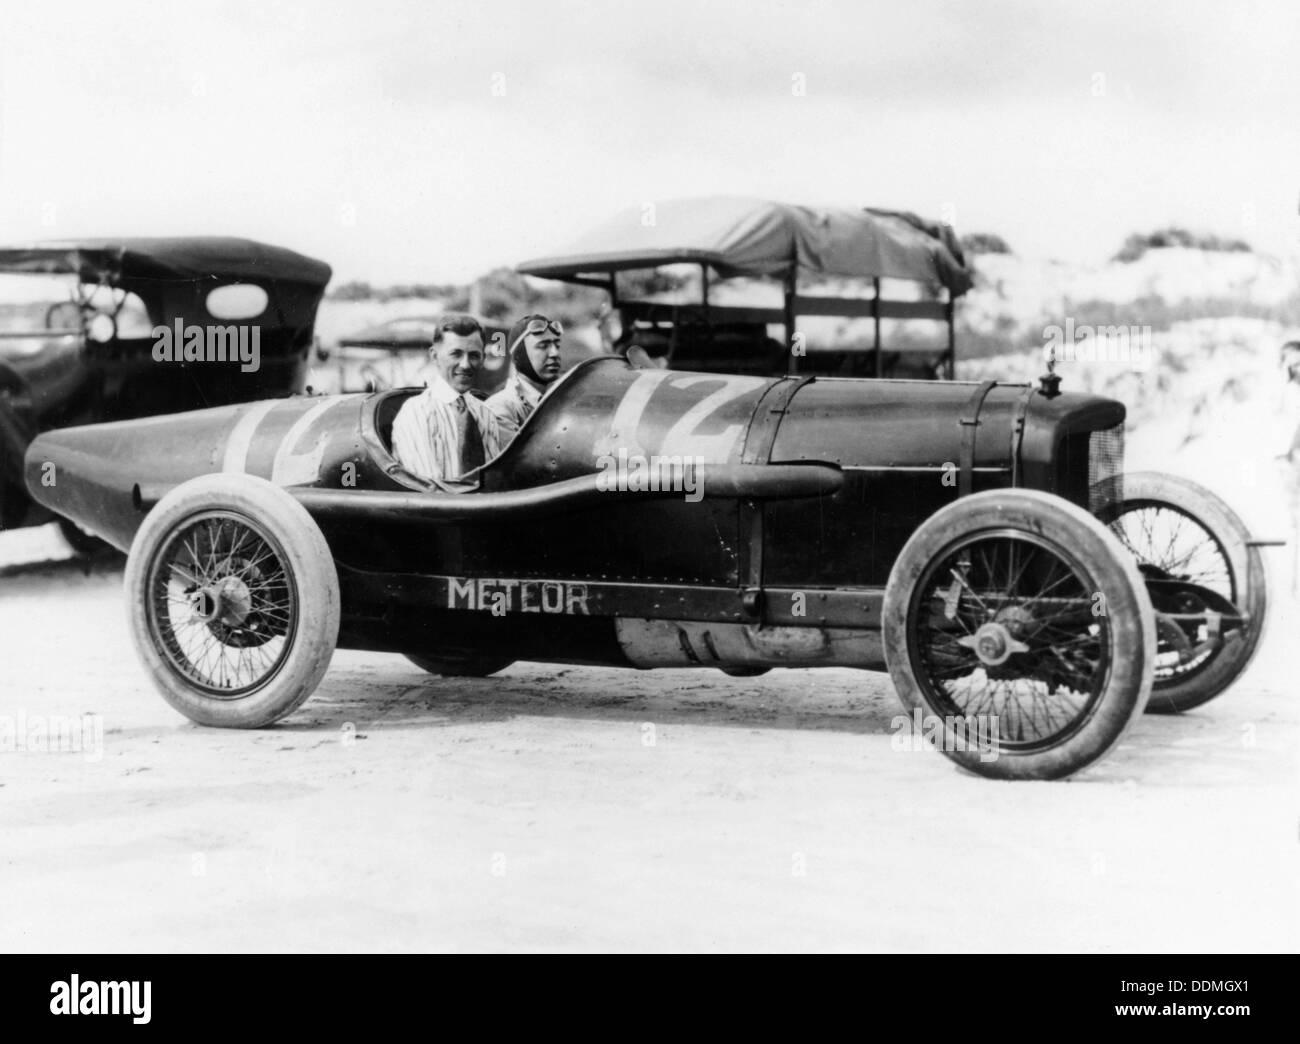 Vintage Sports Car Racing Road America Stock Photos & Vintage Sports ...